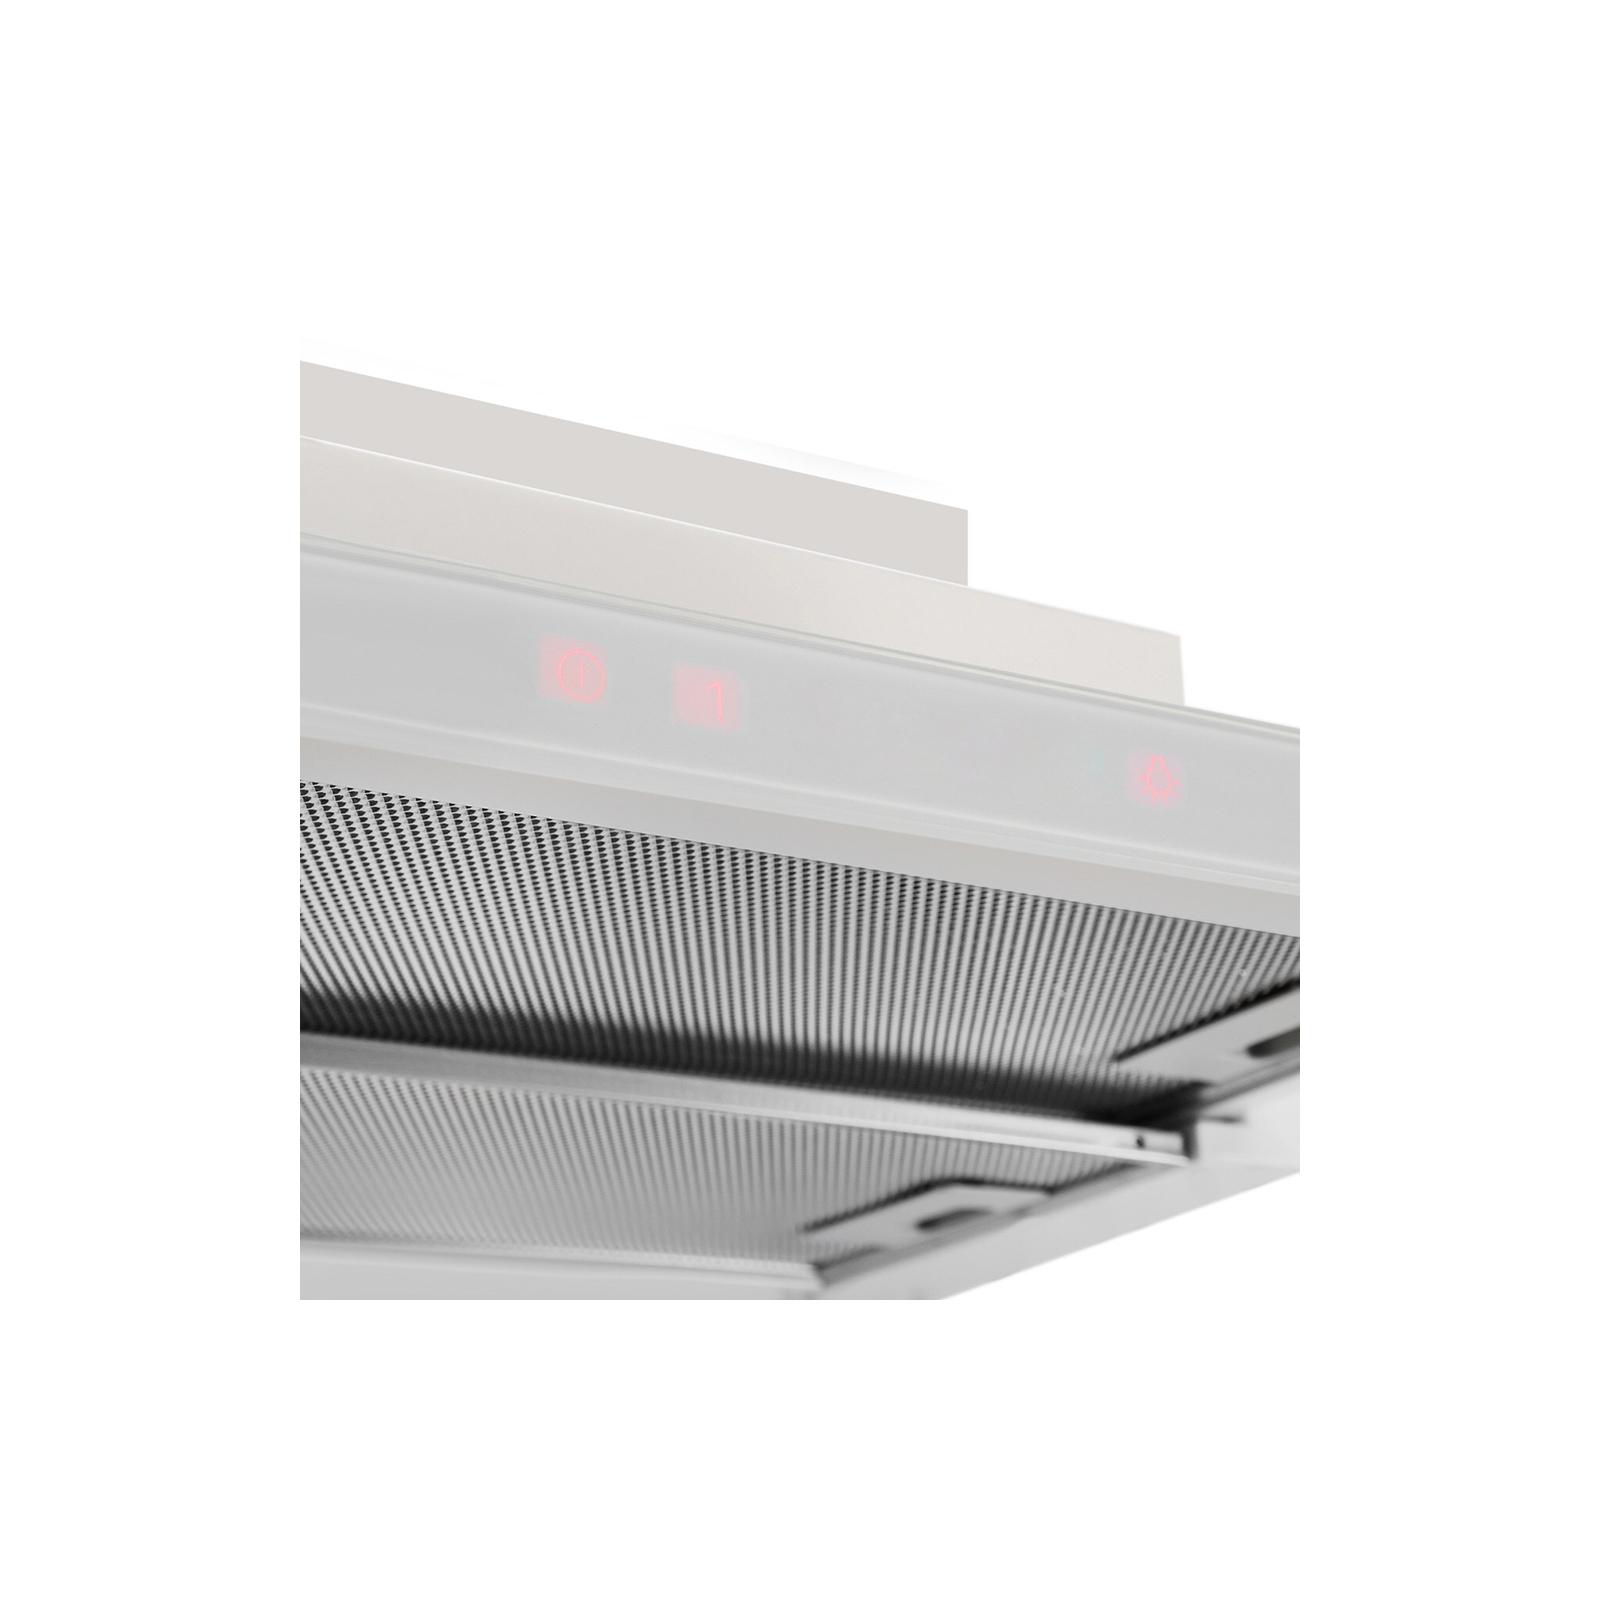 Вытяжка кухонная PERFELLI TLS 6832 W LED изображение 6